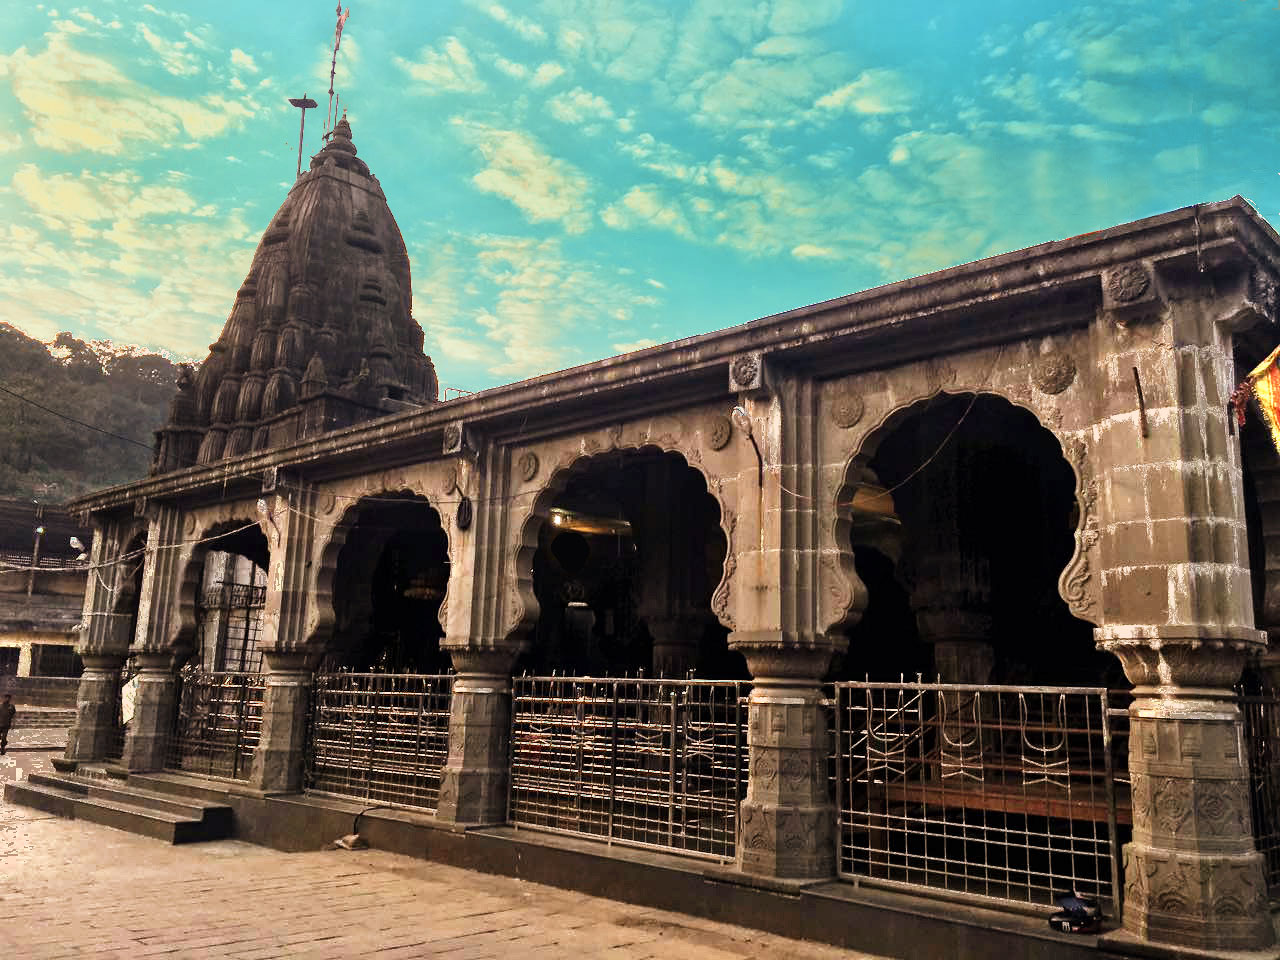 श्री भीमाशंकर ज्योतिर्लिंग :शिव का छठवाँ दिव्य धाम